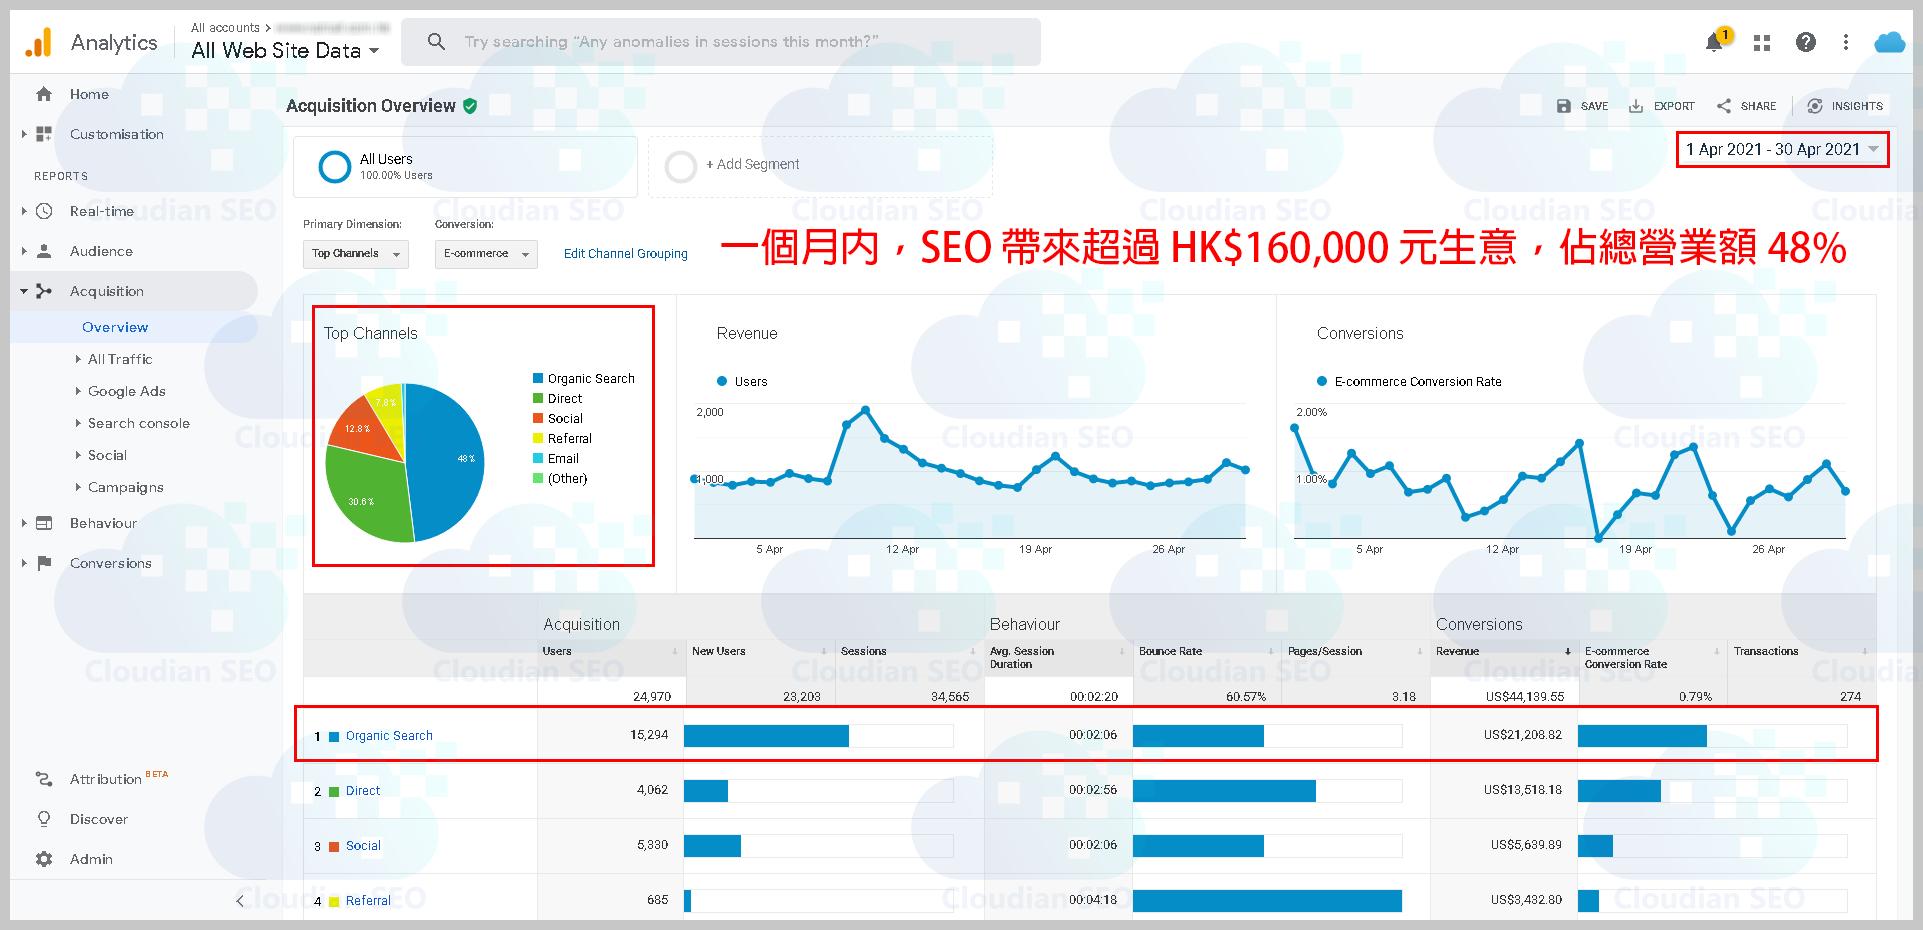 GA SEO Revenue (Chinese)